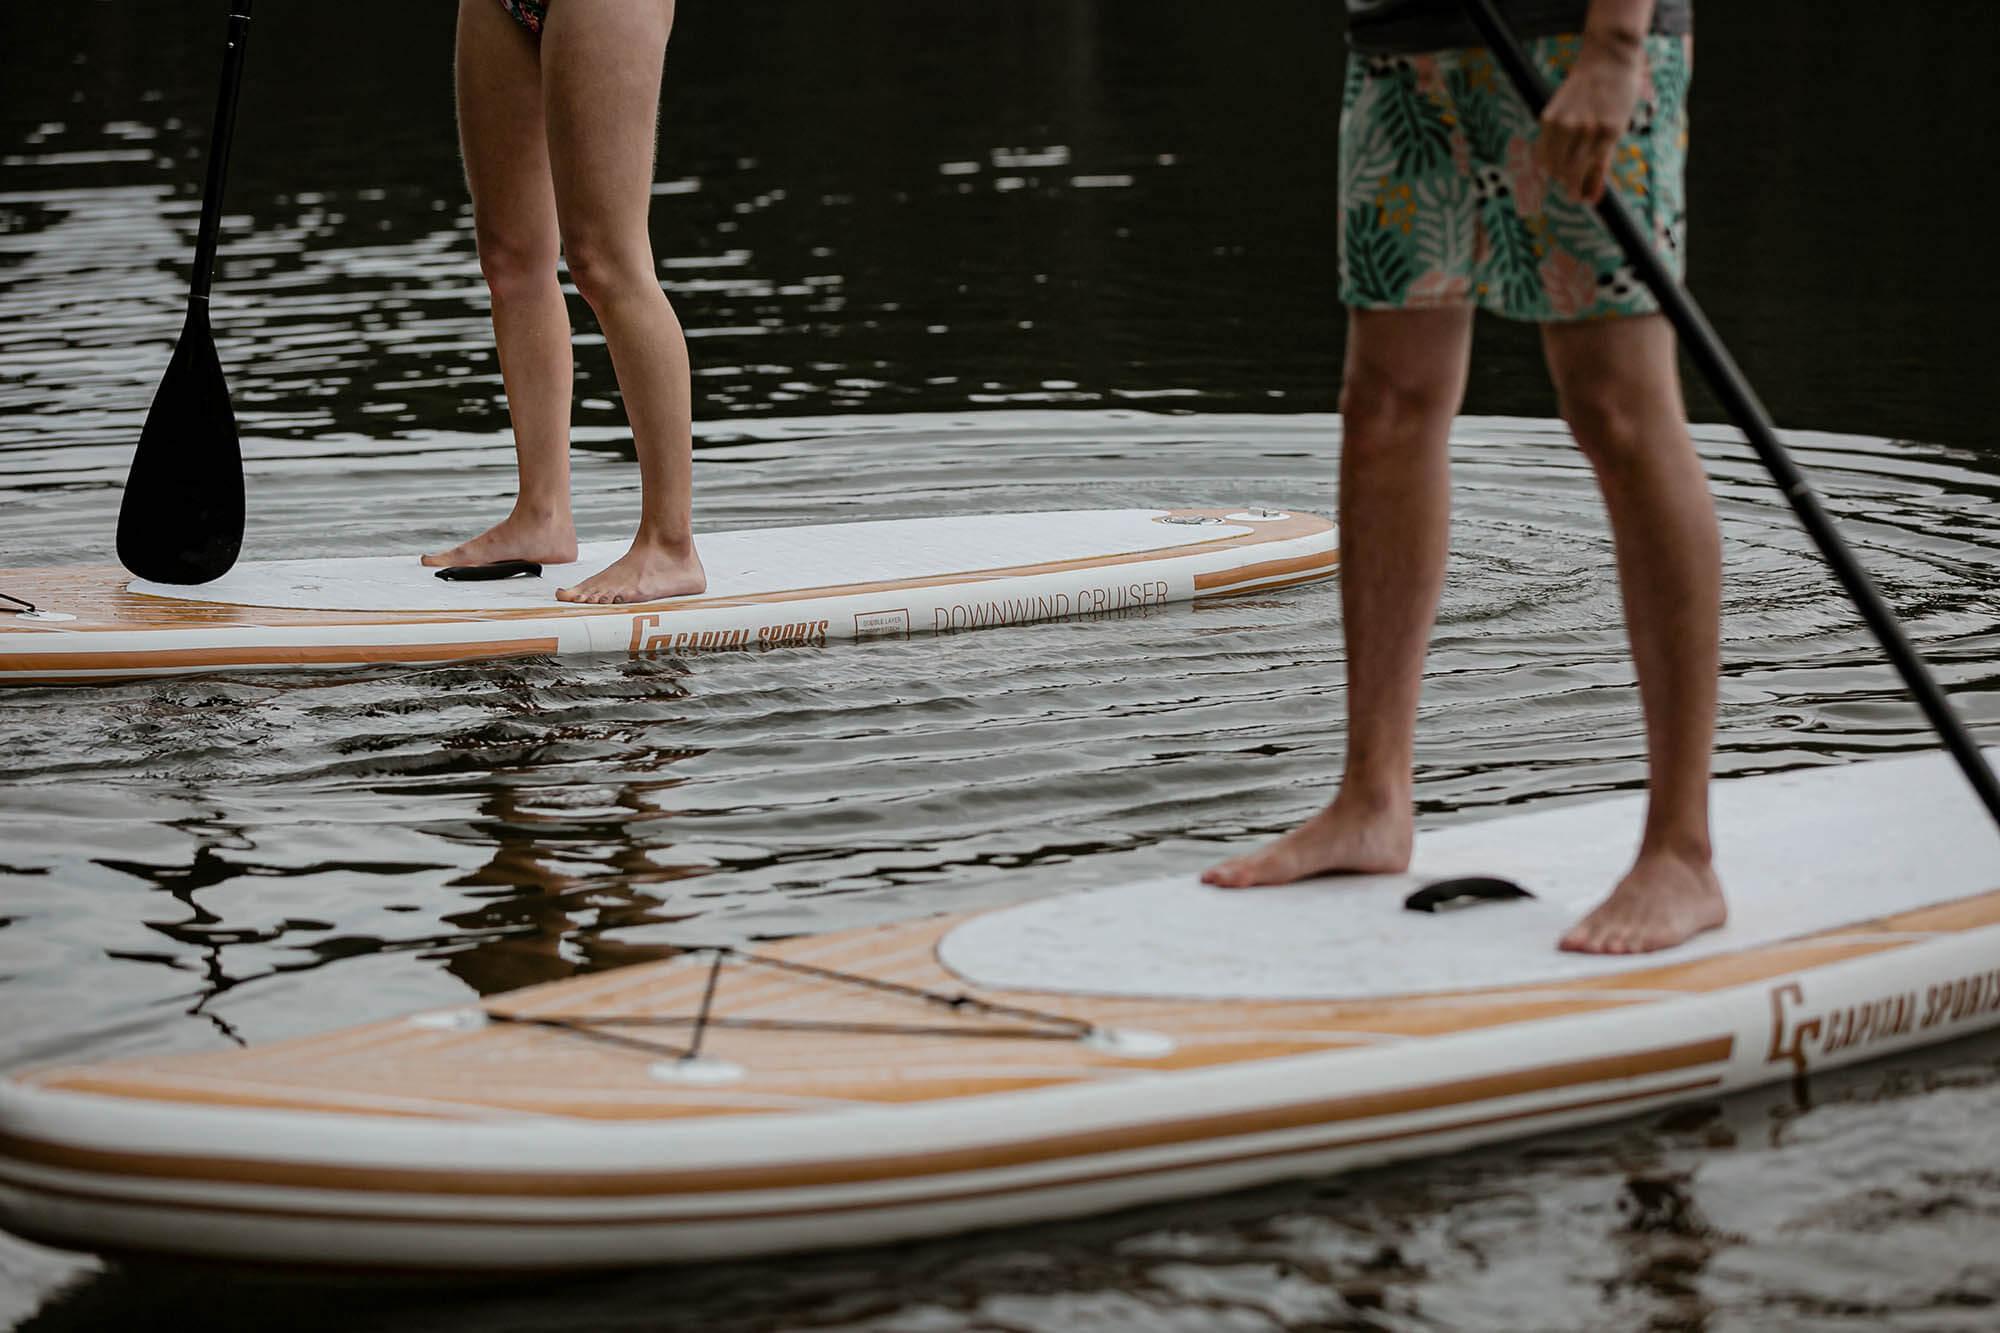 Urlaub Dahoam: Stand Up Paddeln am See